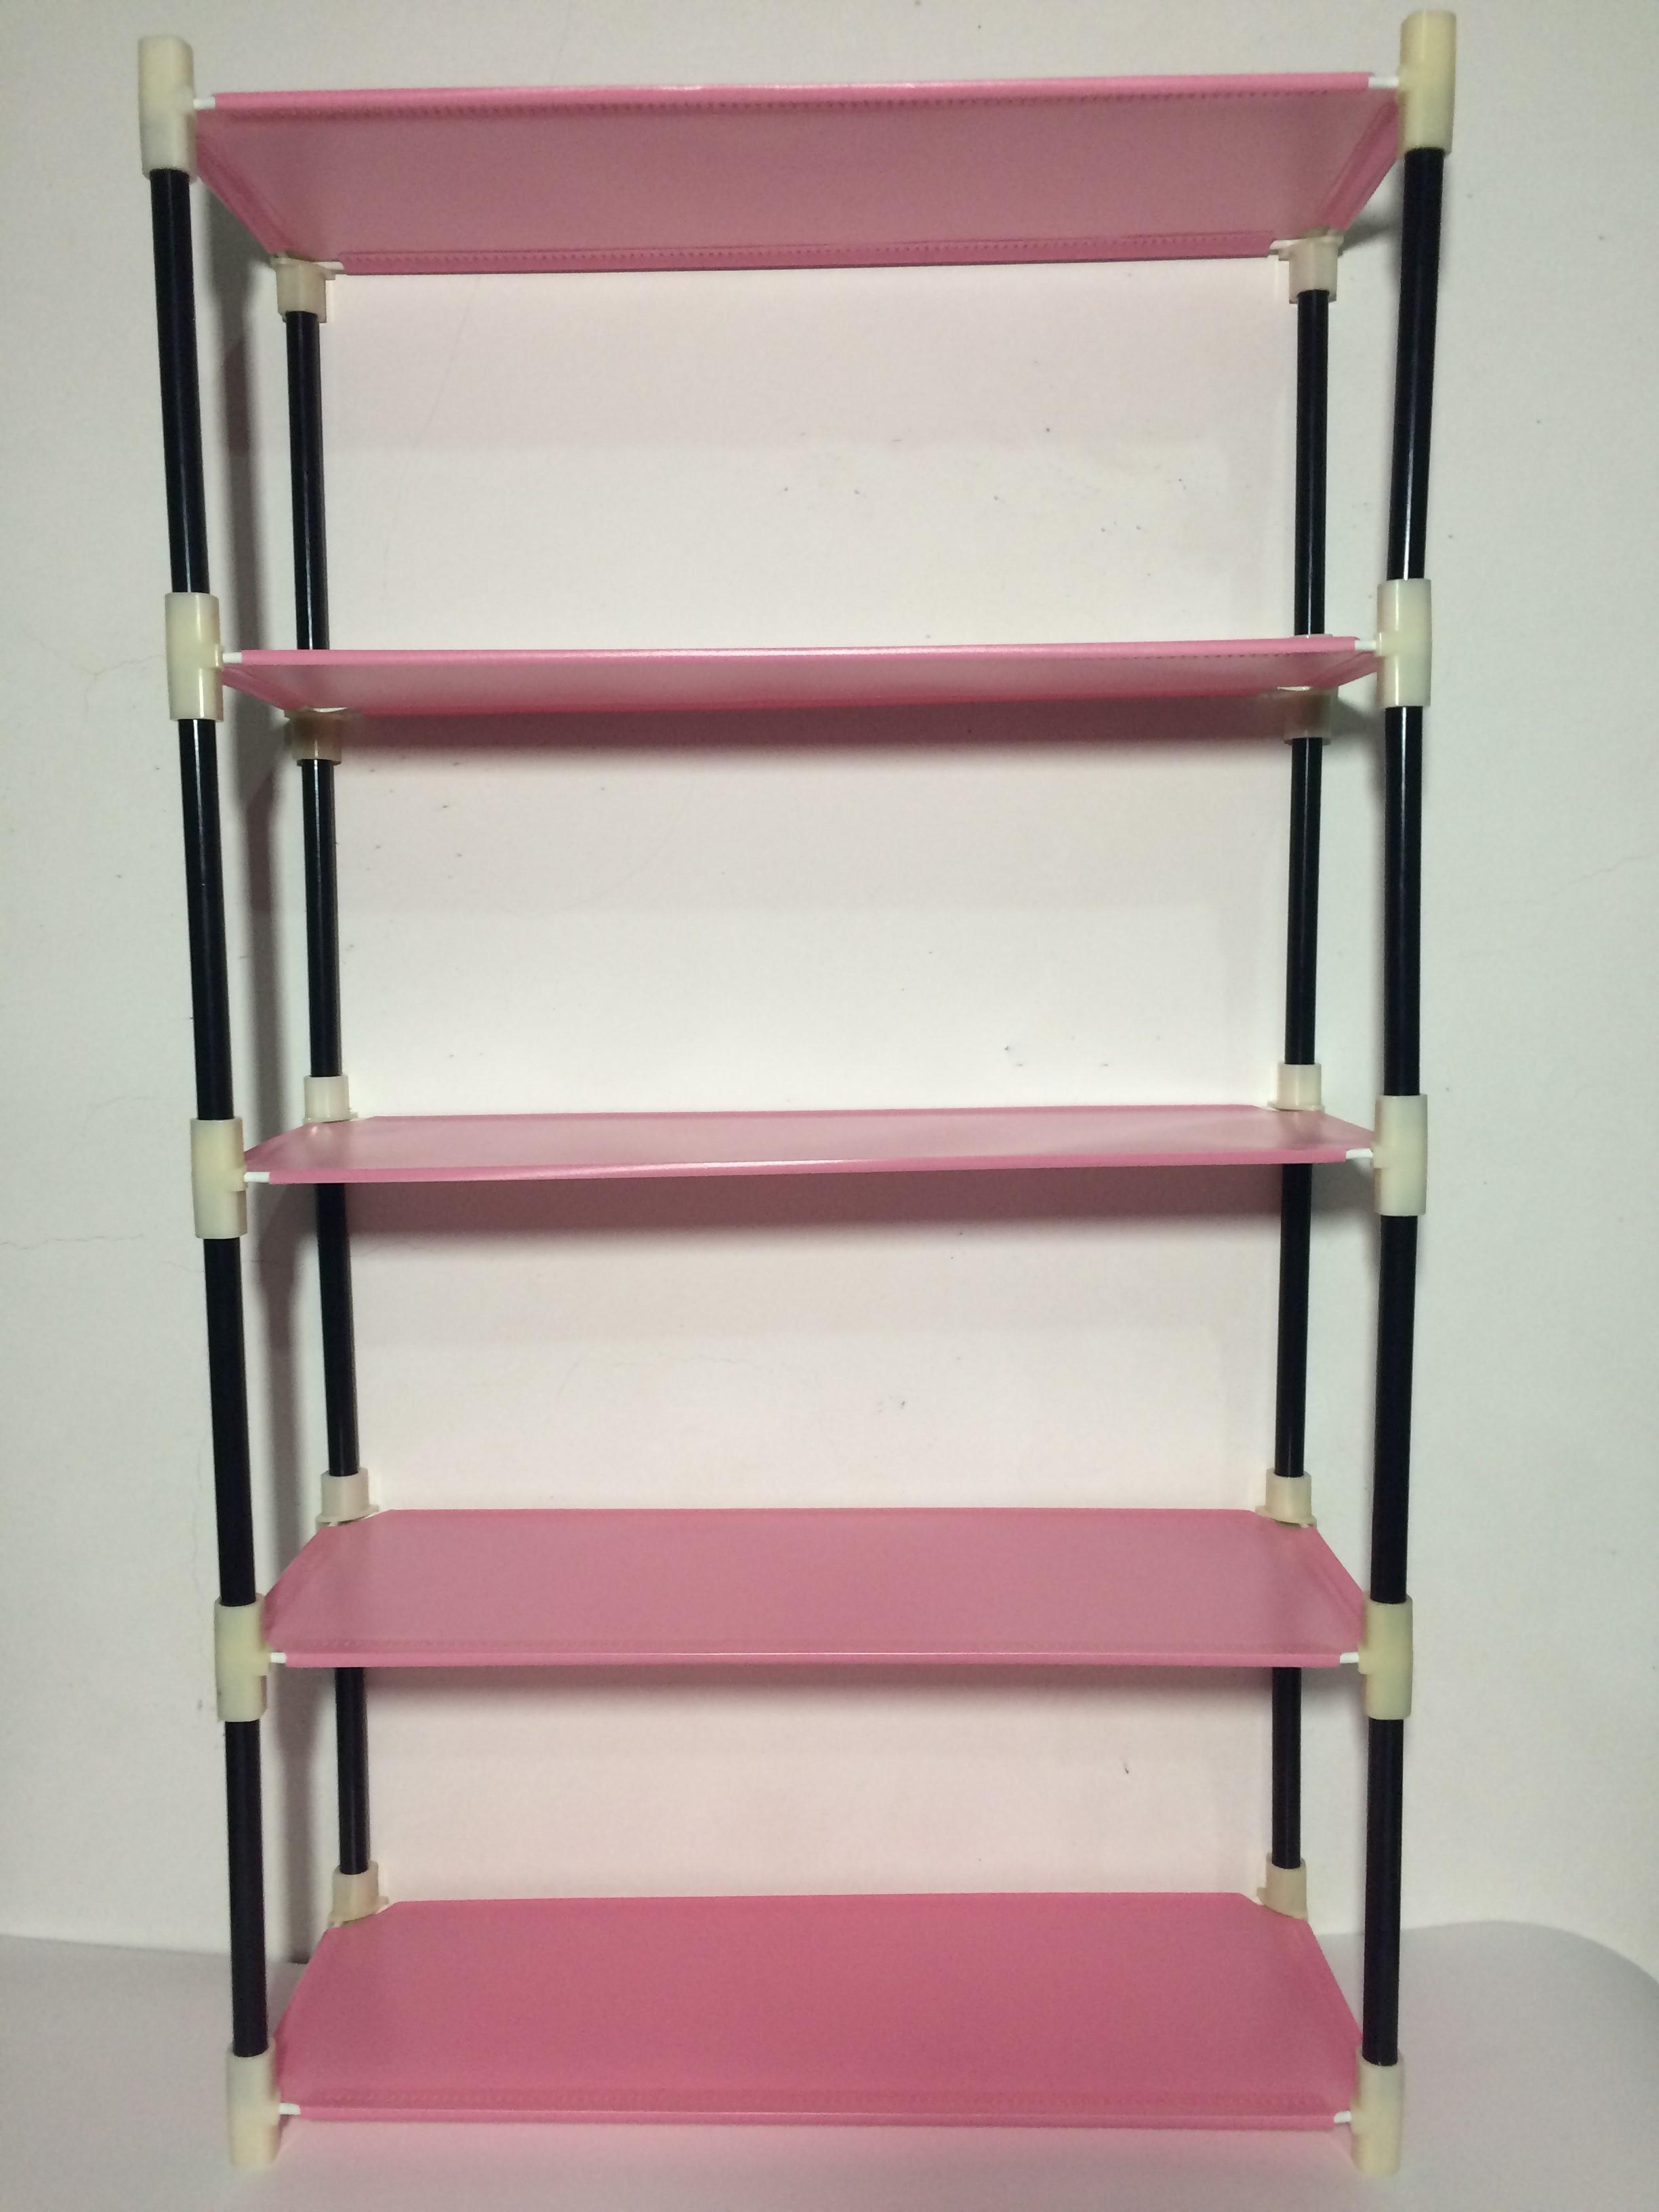 2017 Living Room Bathroom Storage Rack Stand Storage Rack Storage Holders Racks 5 Layers